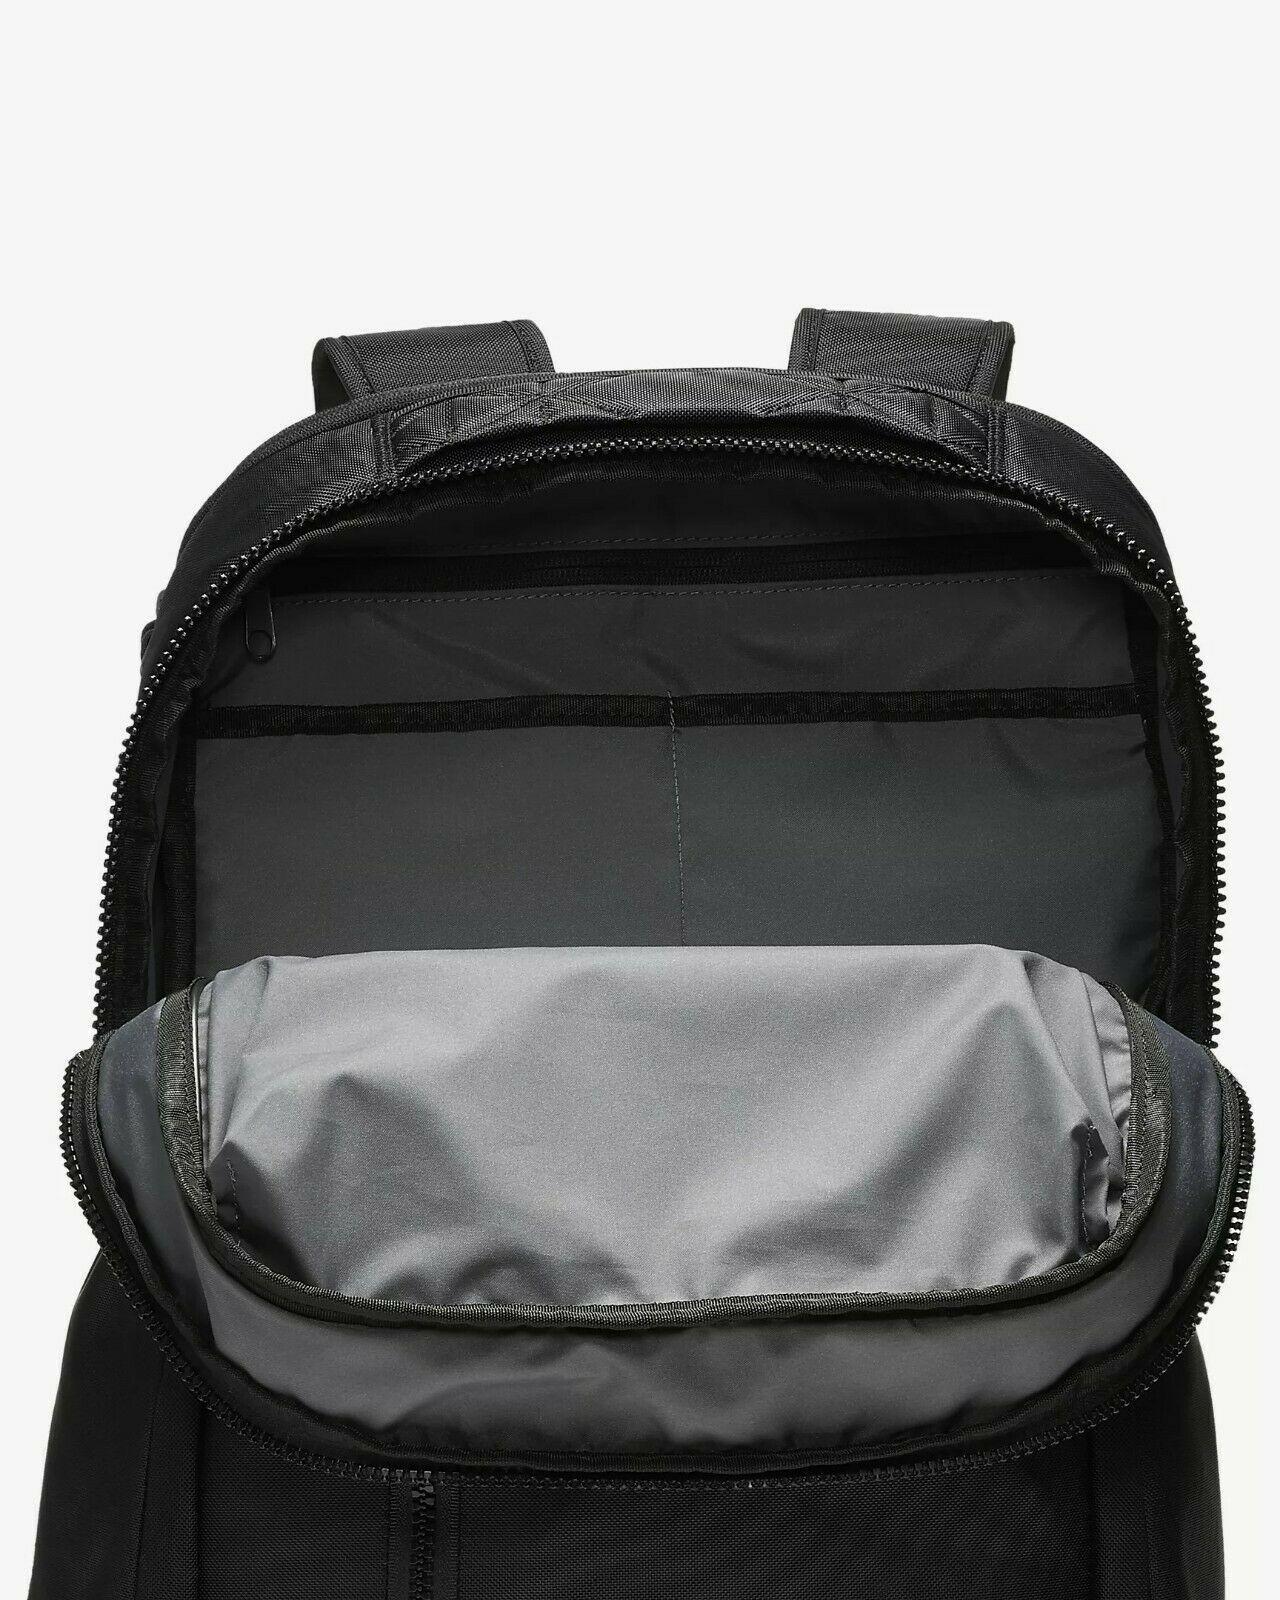 Nike Vapor Power 2.0 Training Backpack, BA5539 010 Black/Black/Black image 9